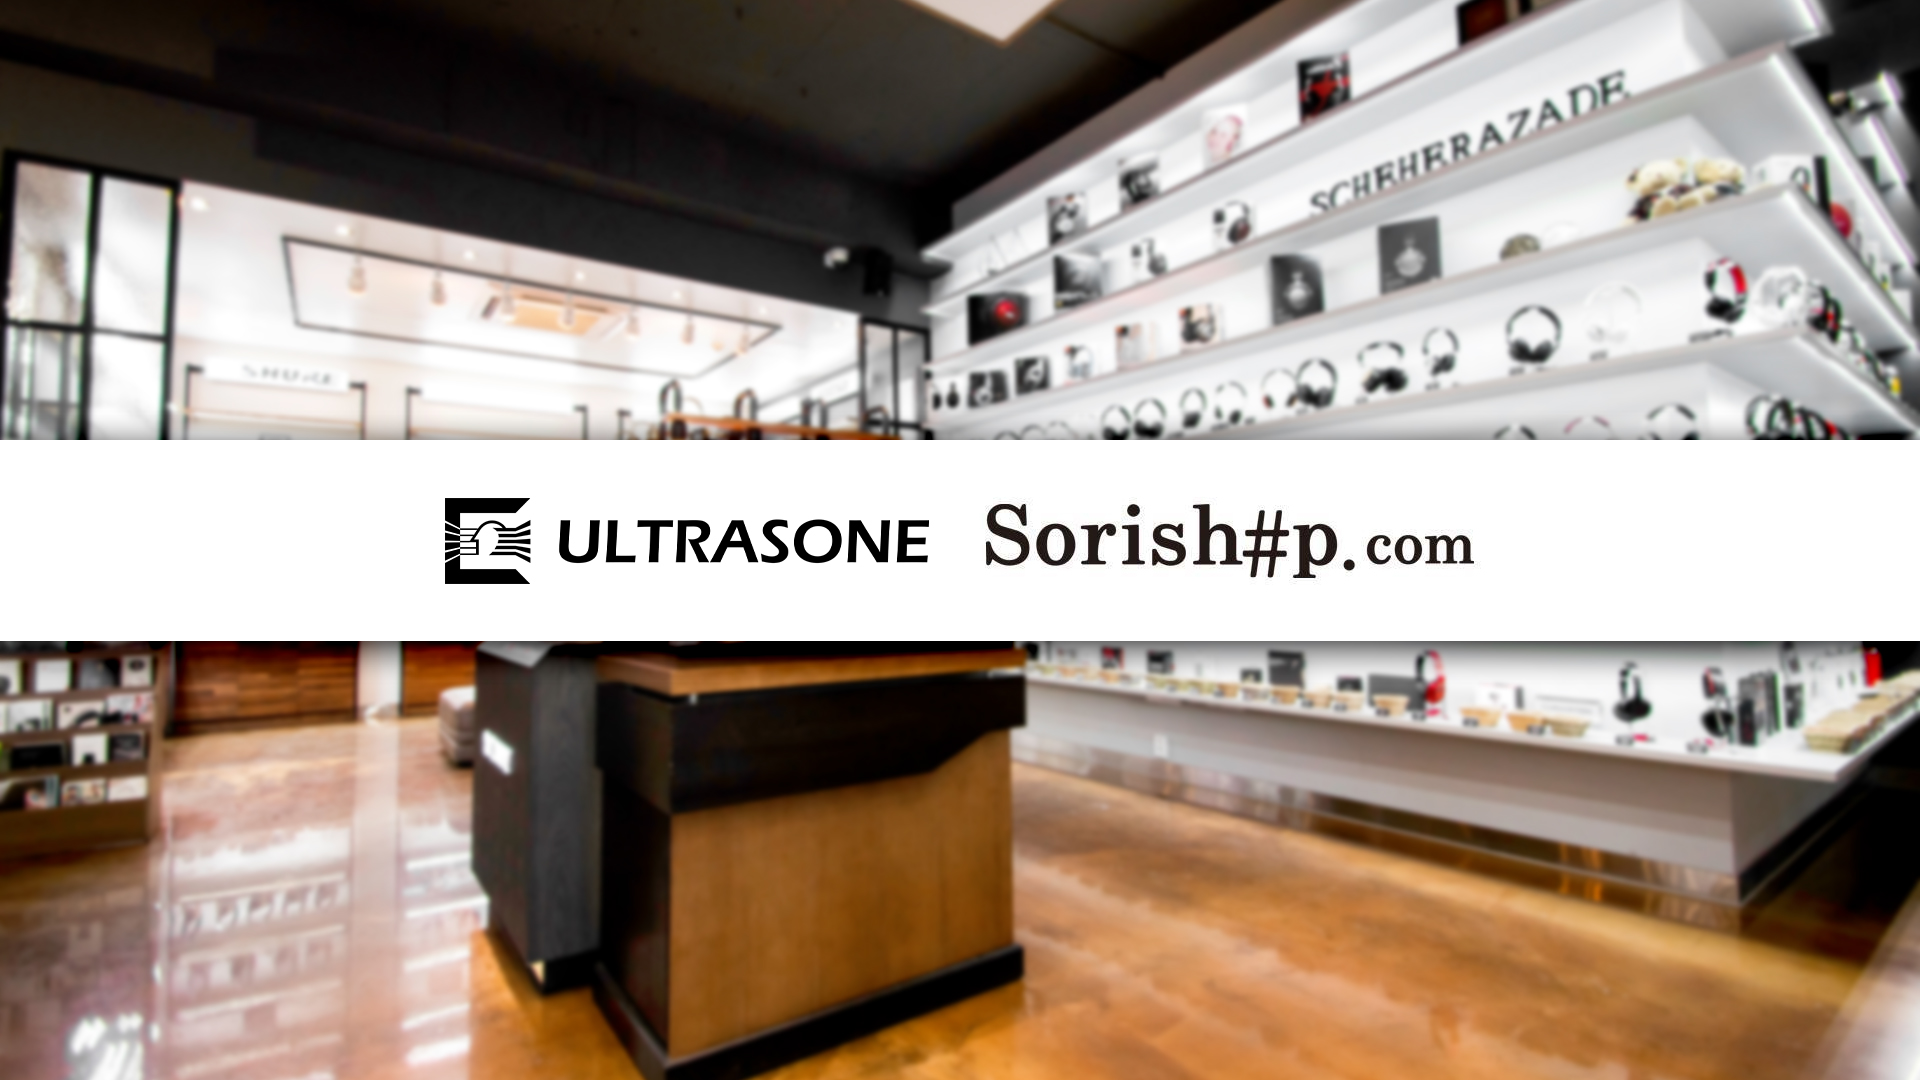 ULTRASONE announces exclusive distribution partnership with Sorishop in South Korea